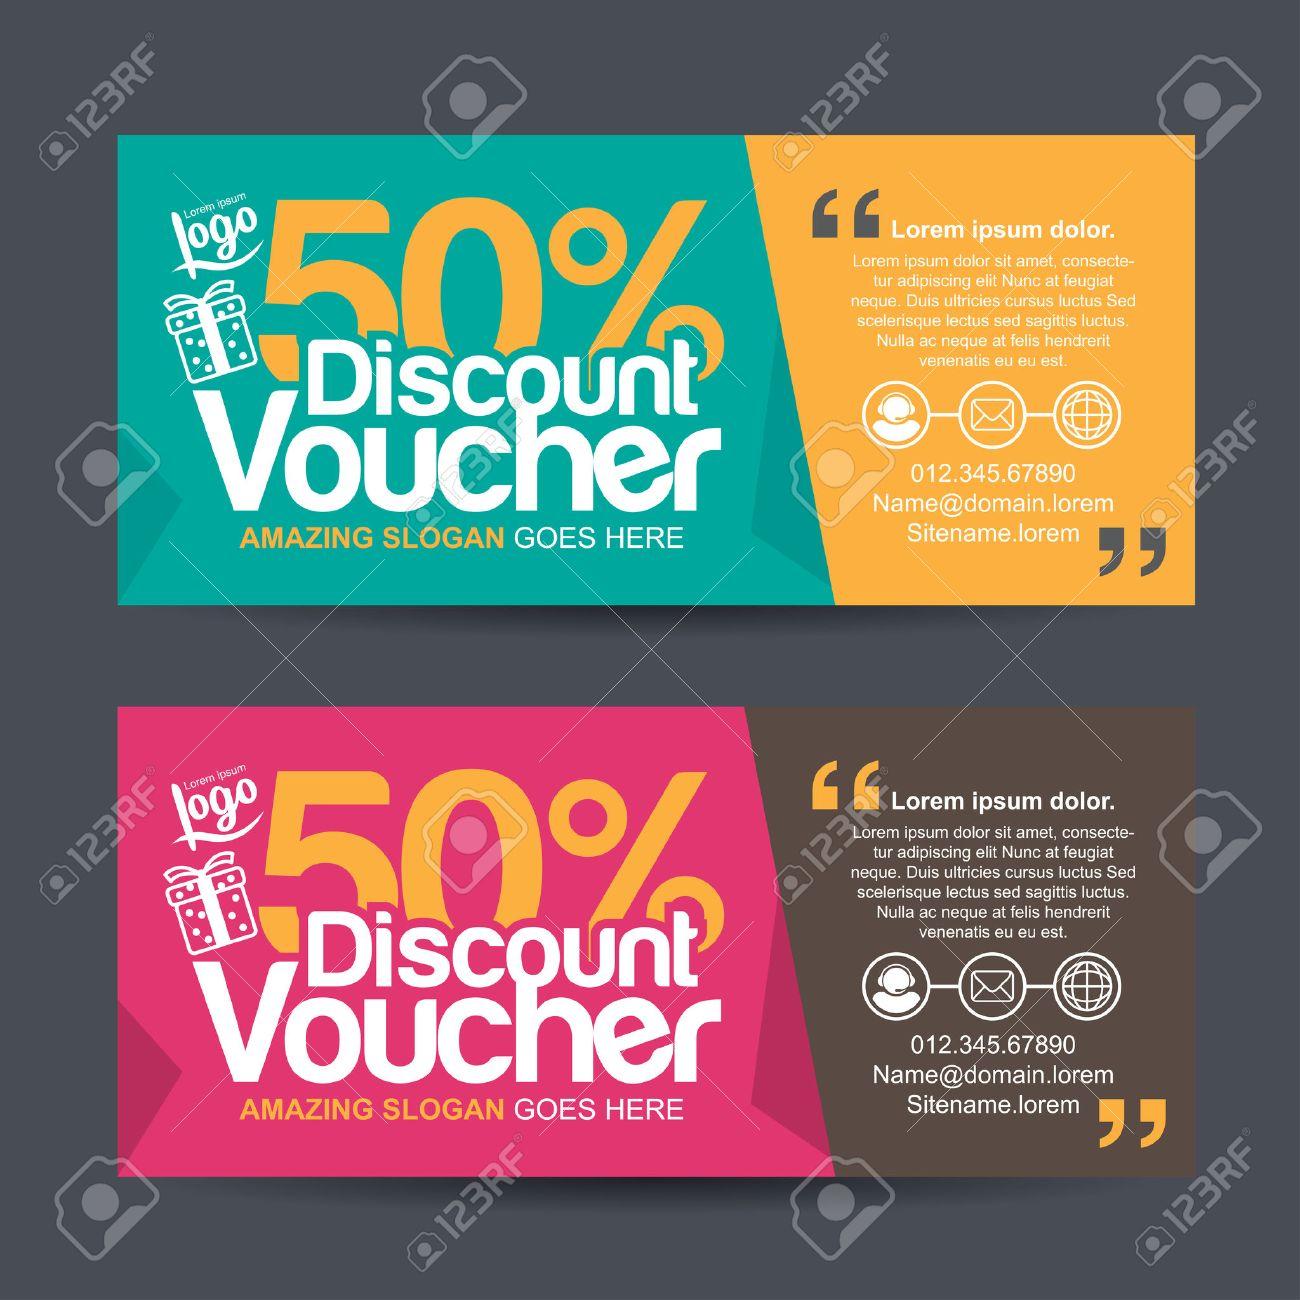 Doc629332 Create Voucher Recurring Payment Voucher REPV 90 – Create Voucher